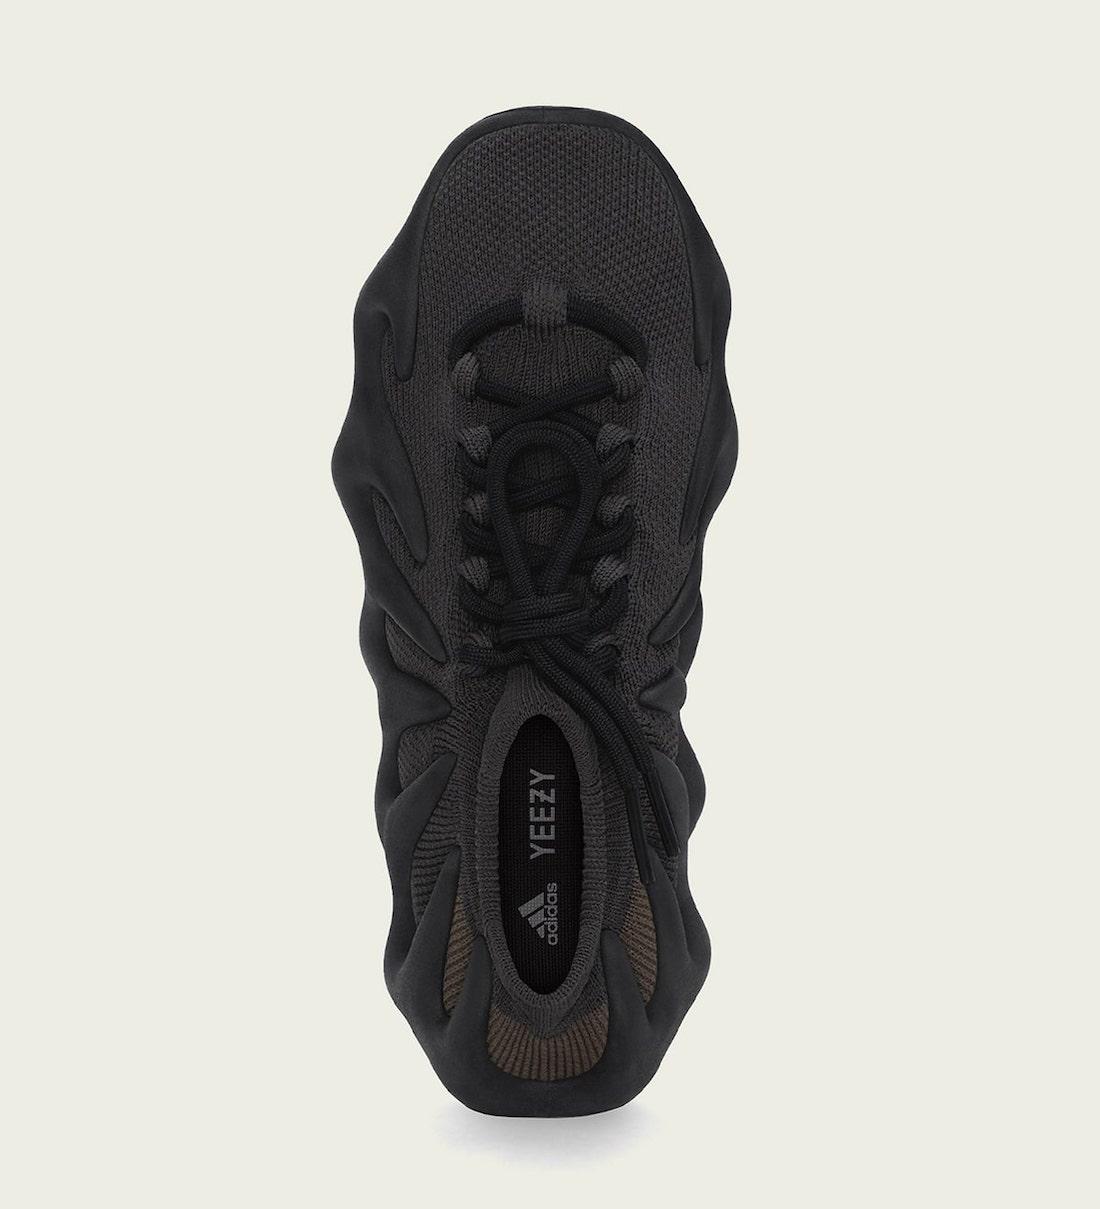 adidas,Yeezy 450,GY5386,发售  预售近三千!黑武士 Yeezy 450 今早登记!拼手速你用了几秒?